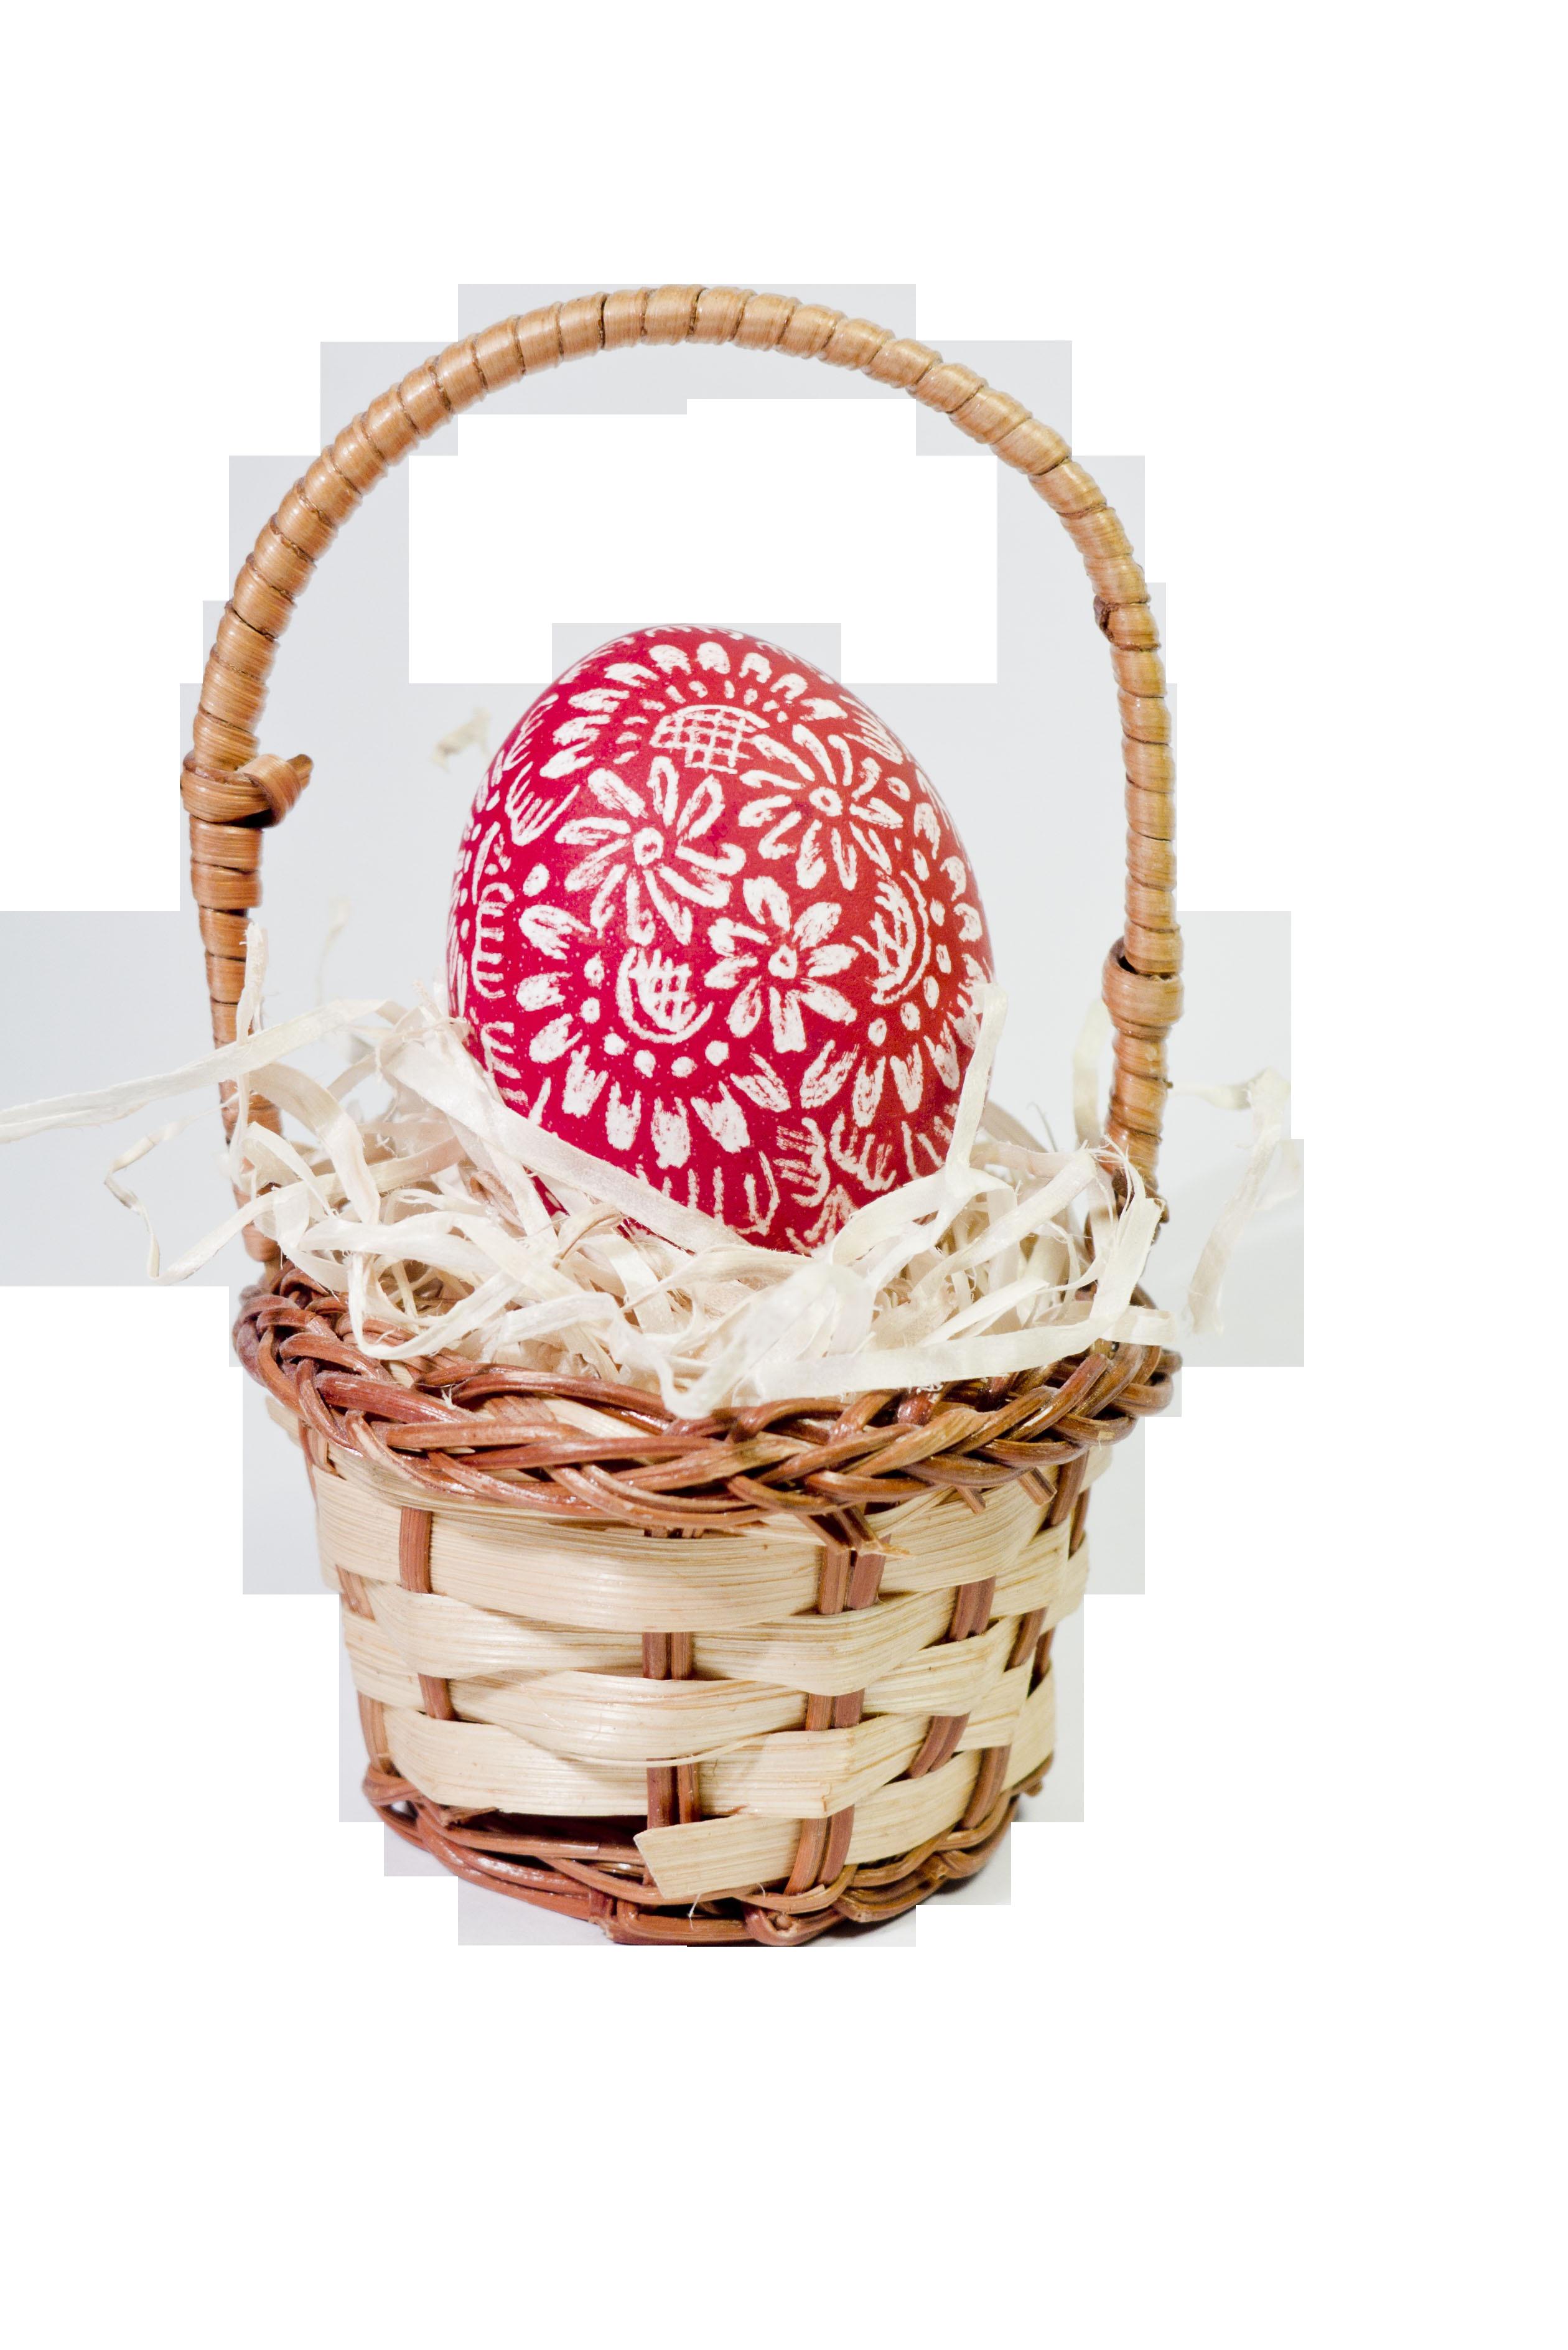 eggs-1221991_Clip